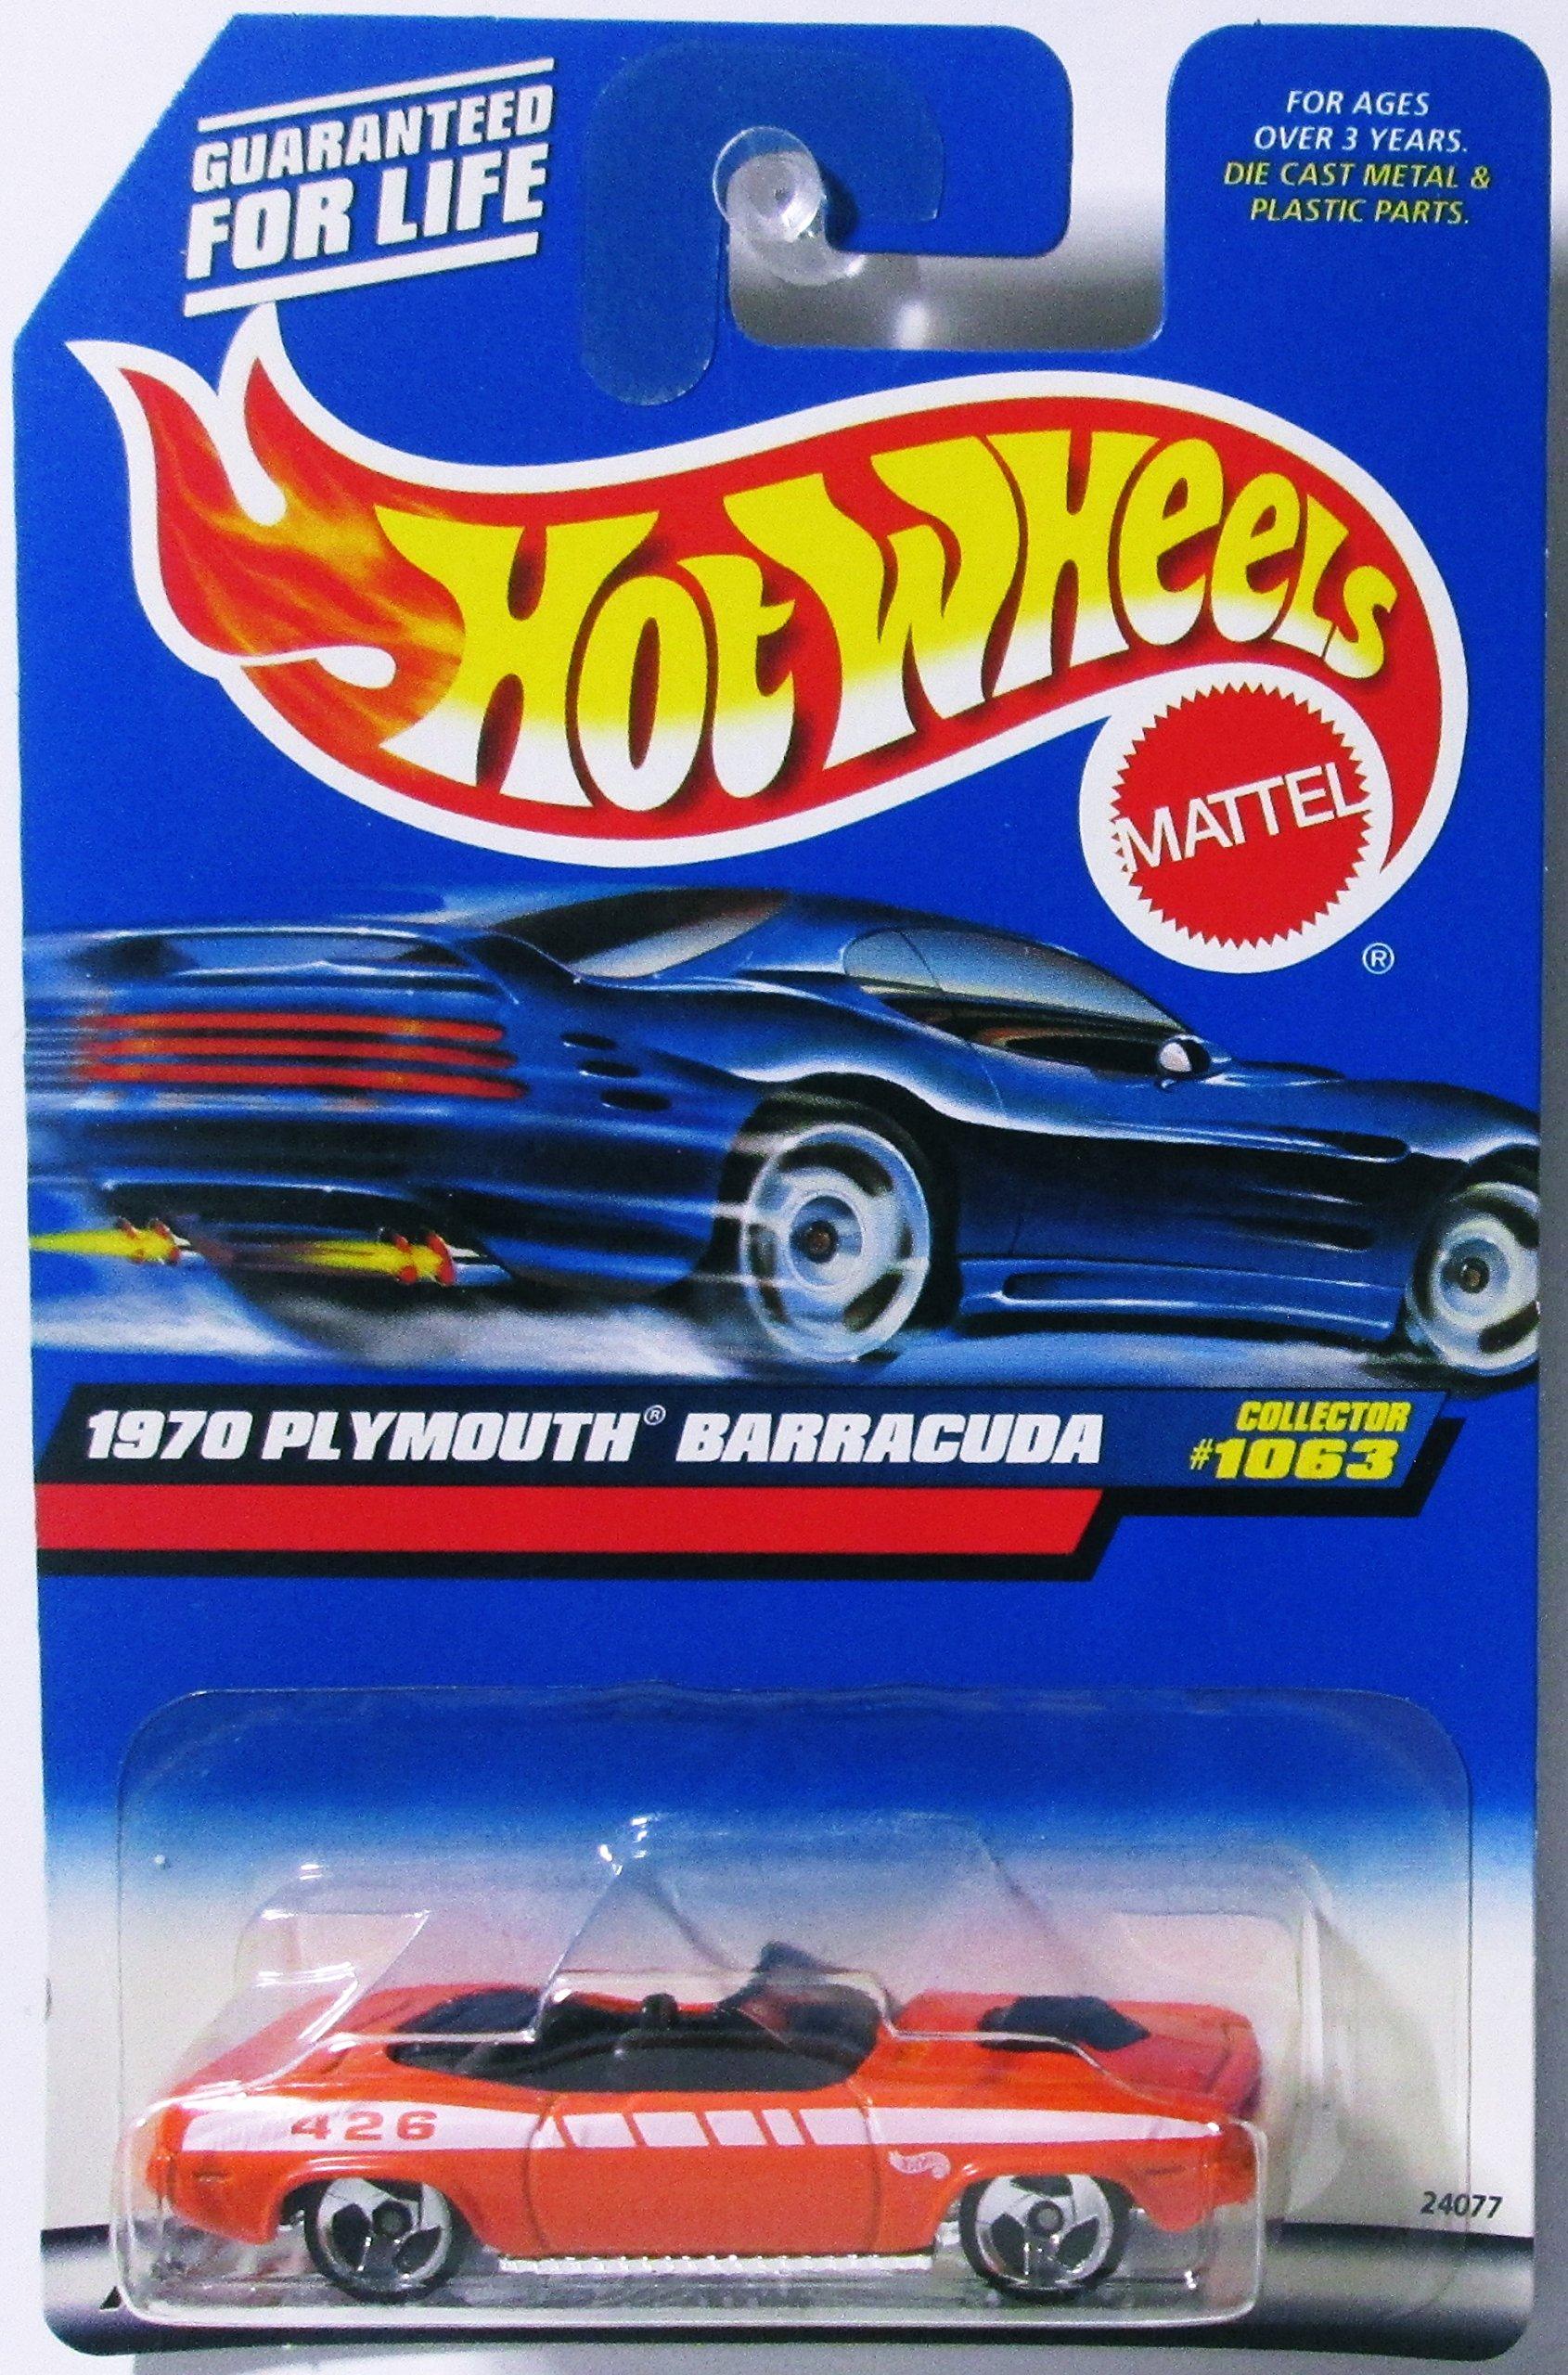 Mattel Hot Wheels 1999 1:64 Scale Orange 1970 Plymouth Barracuda Die Cast Car Collector #1063